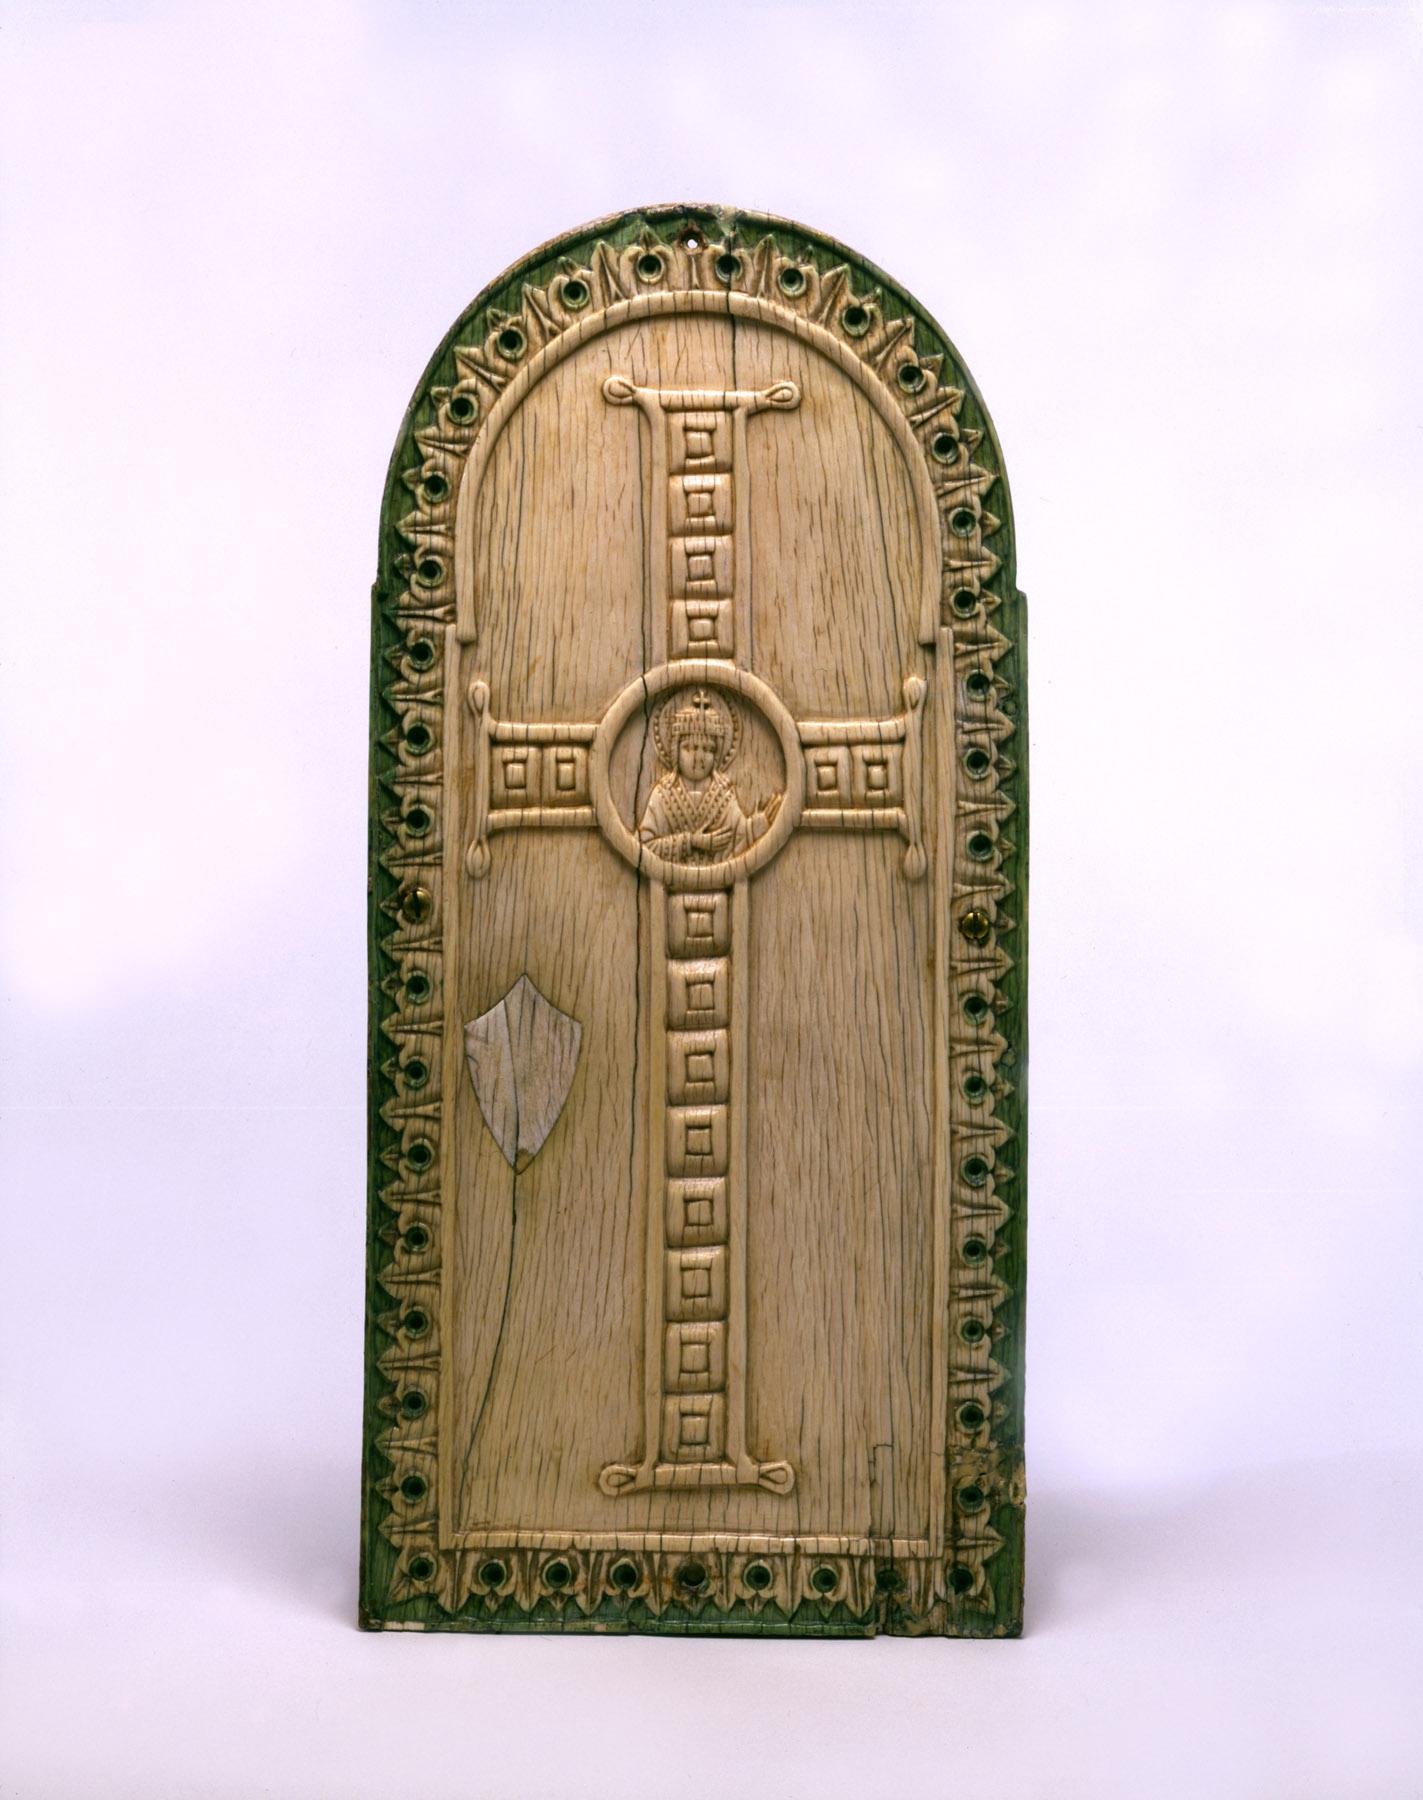 BZ.1937.18, Jeweled Cross Ivory